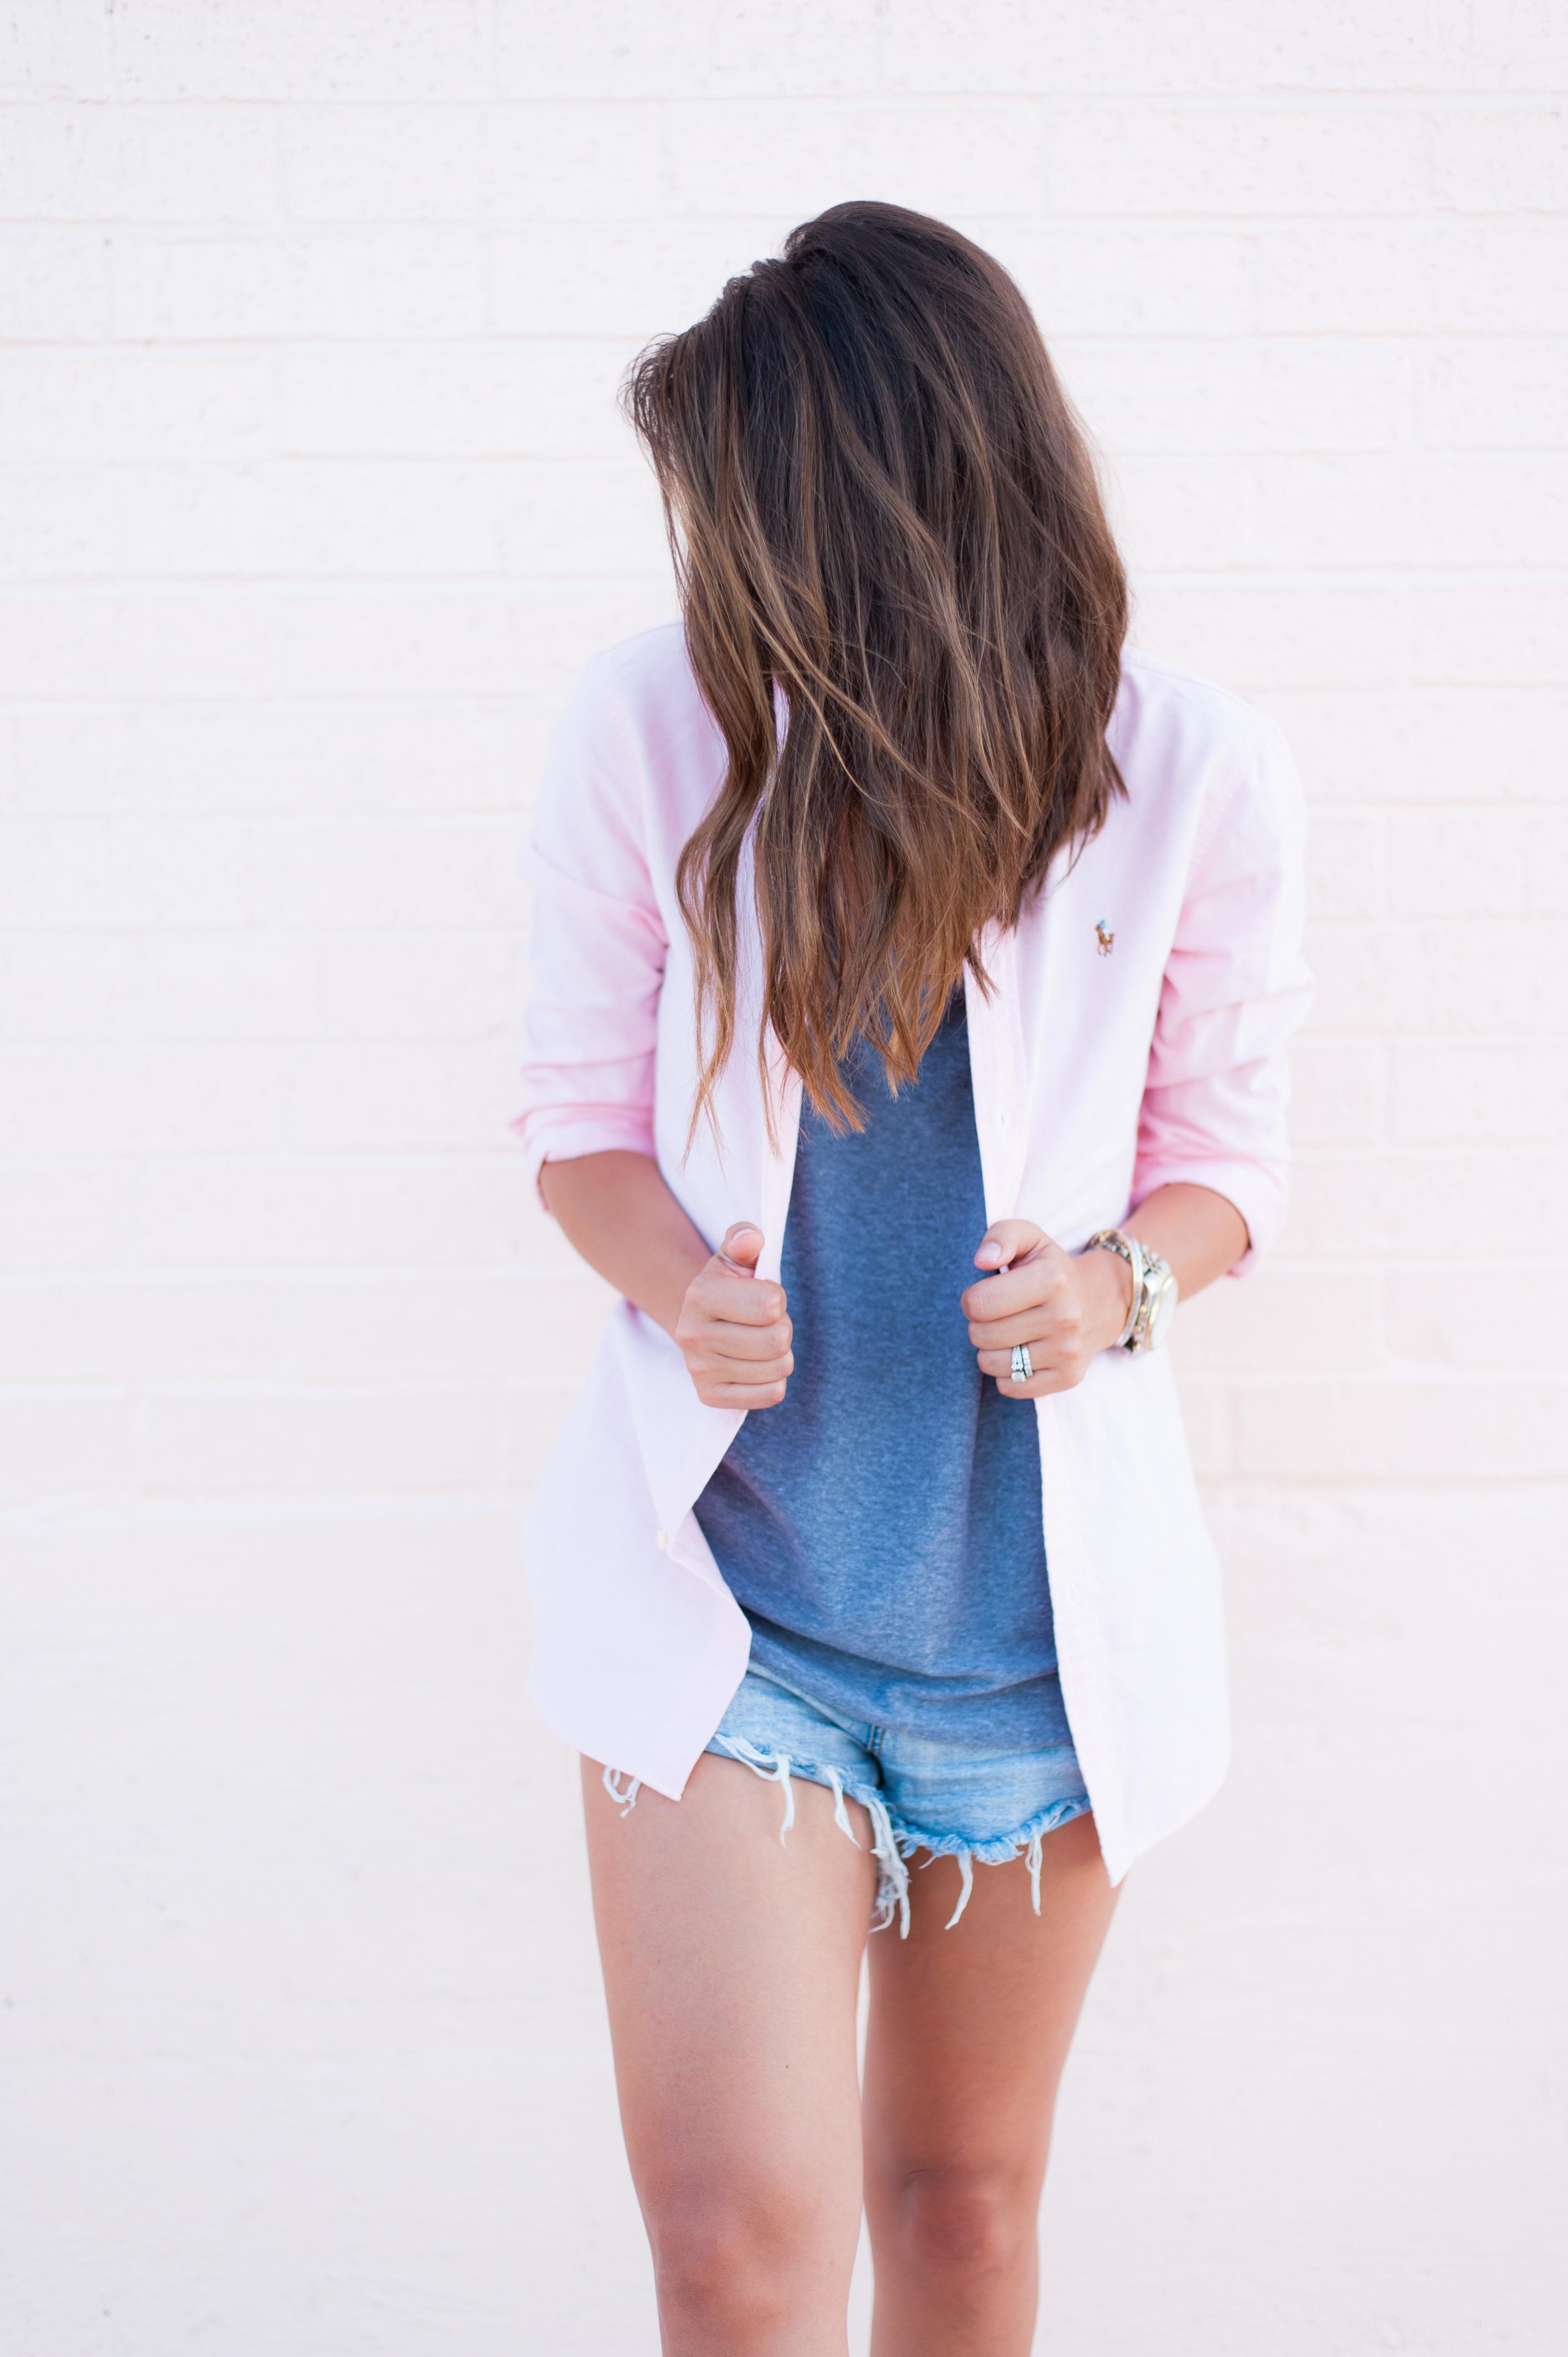 dress_up_buttercup_dede_raad_houston_fashion_fashion_blog (7 of 10)